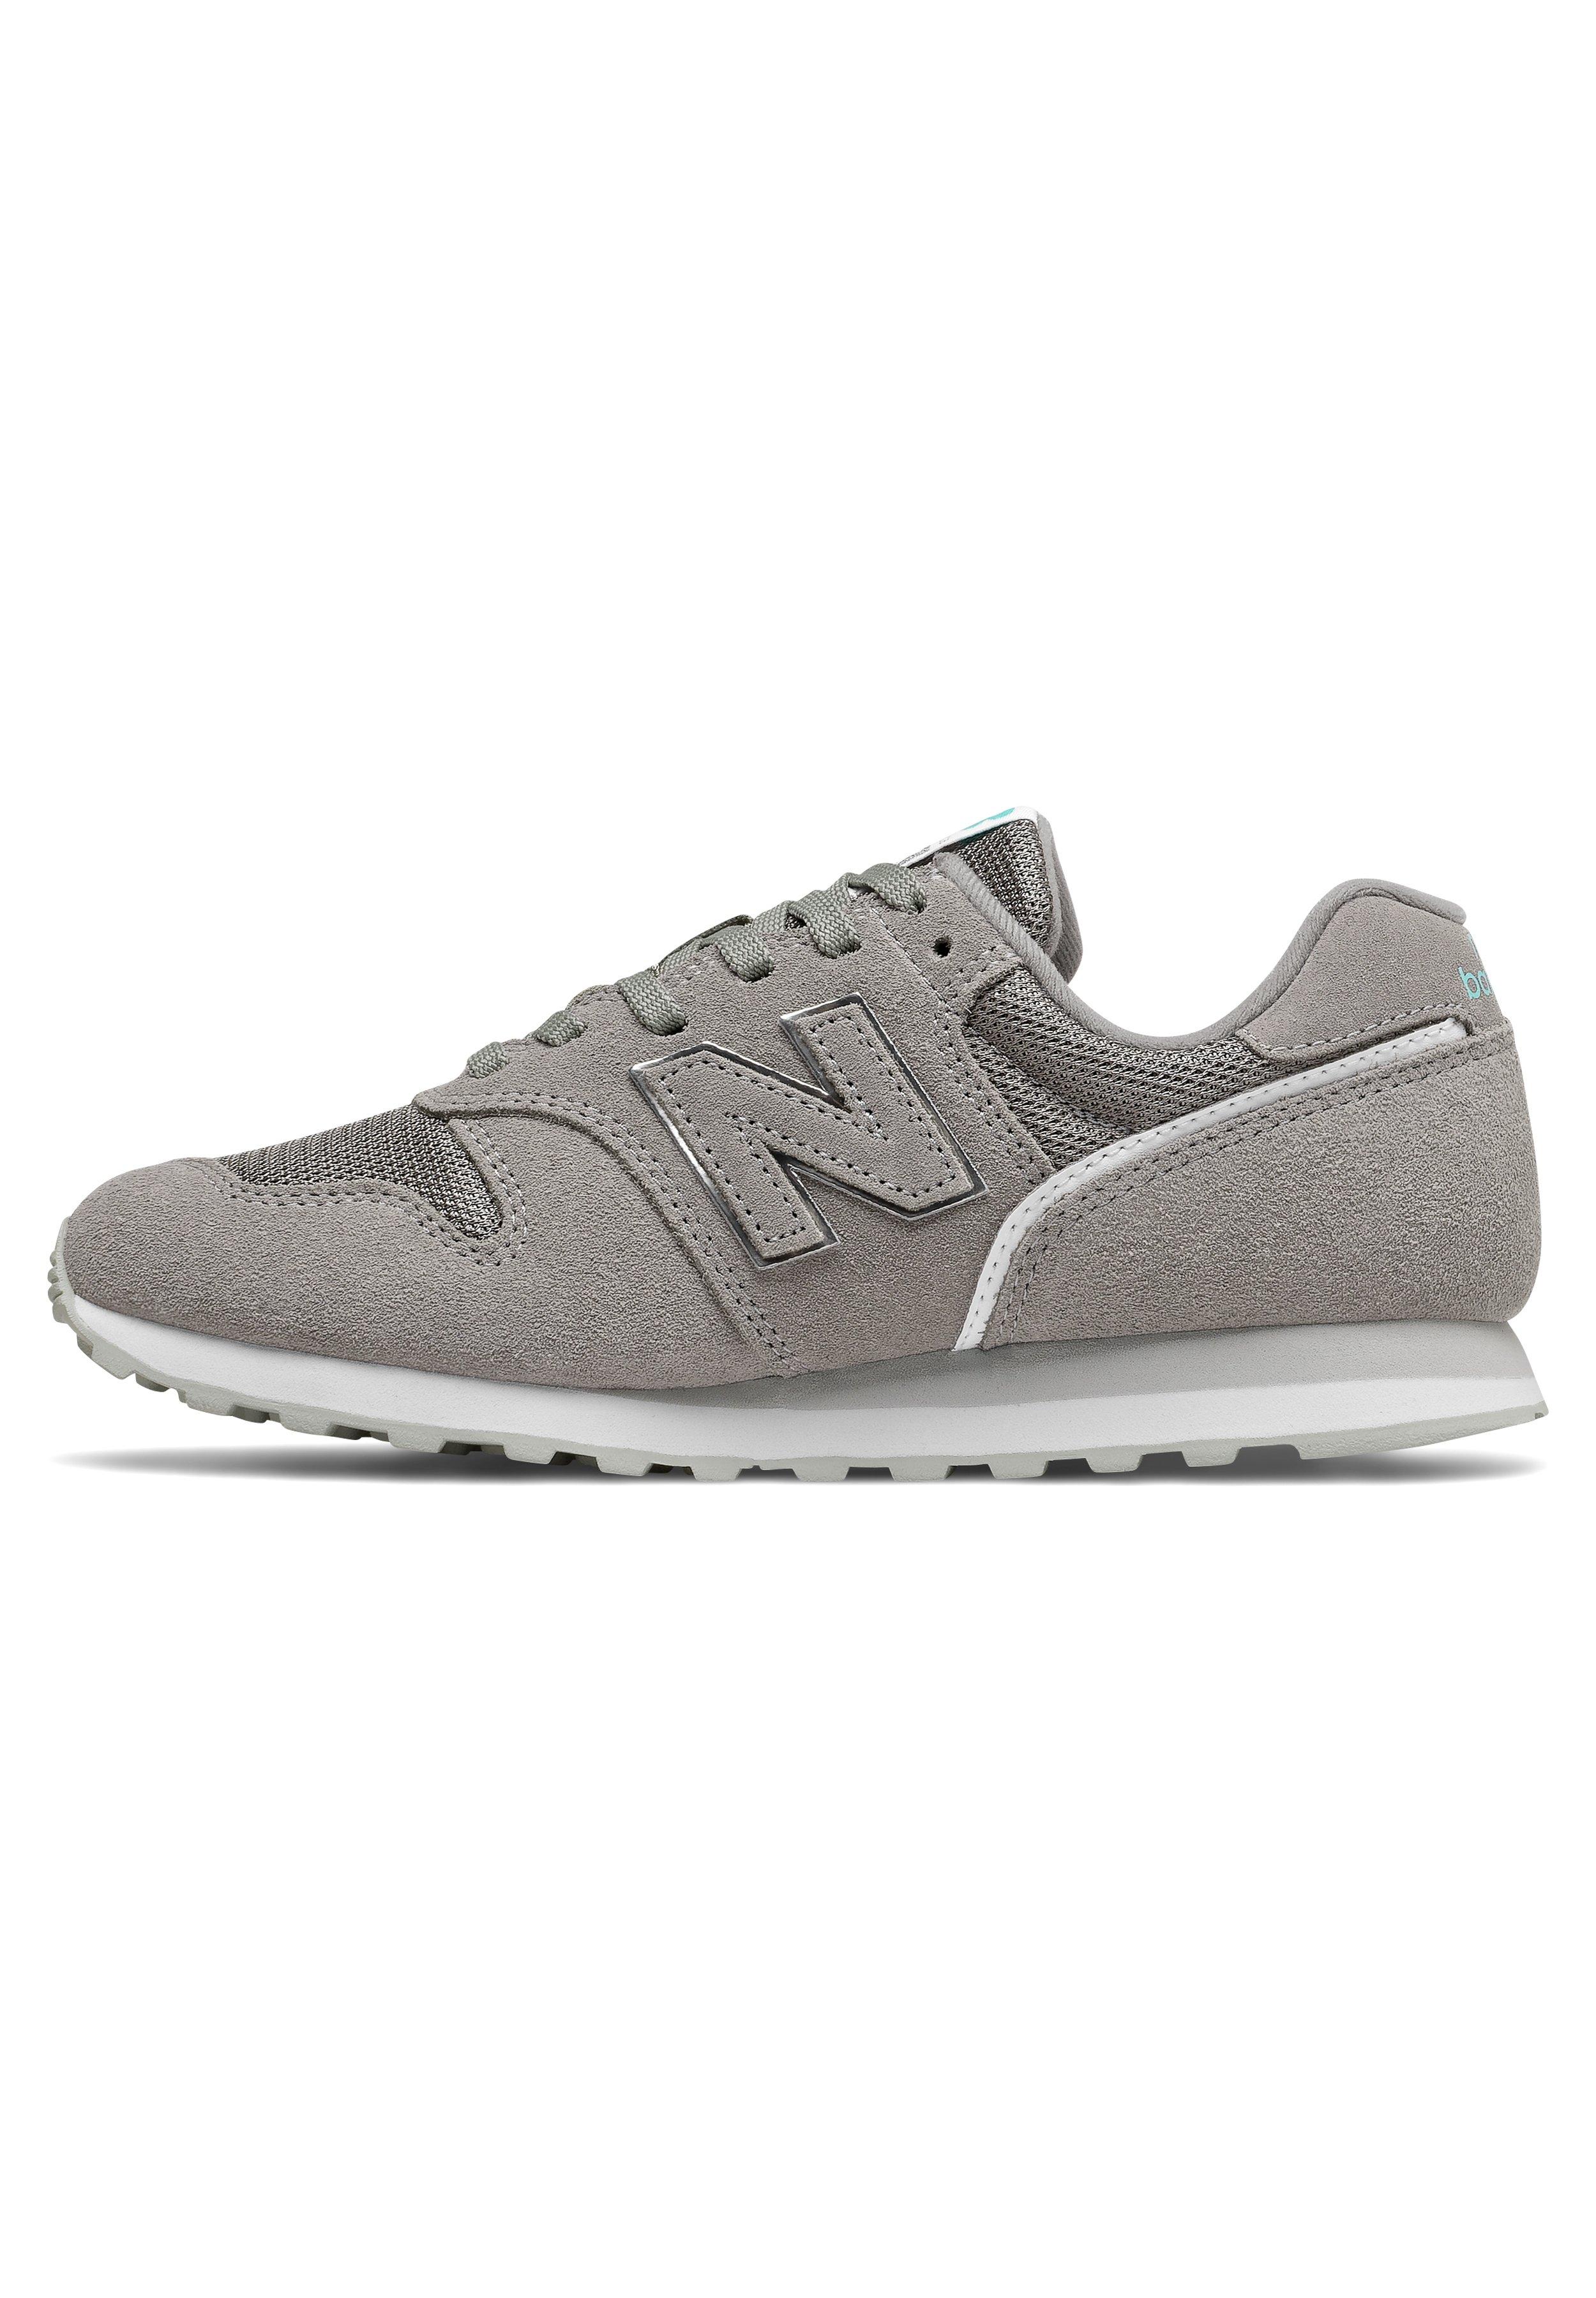 Women 327 - Trainers - grey